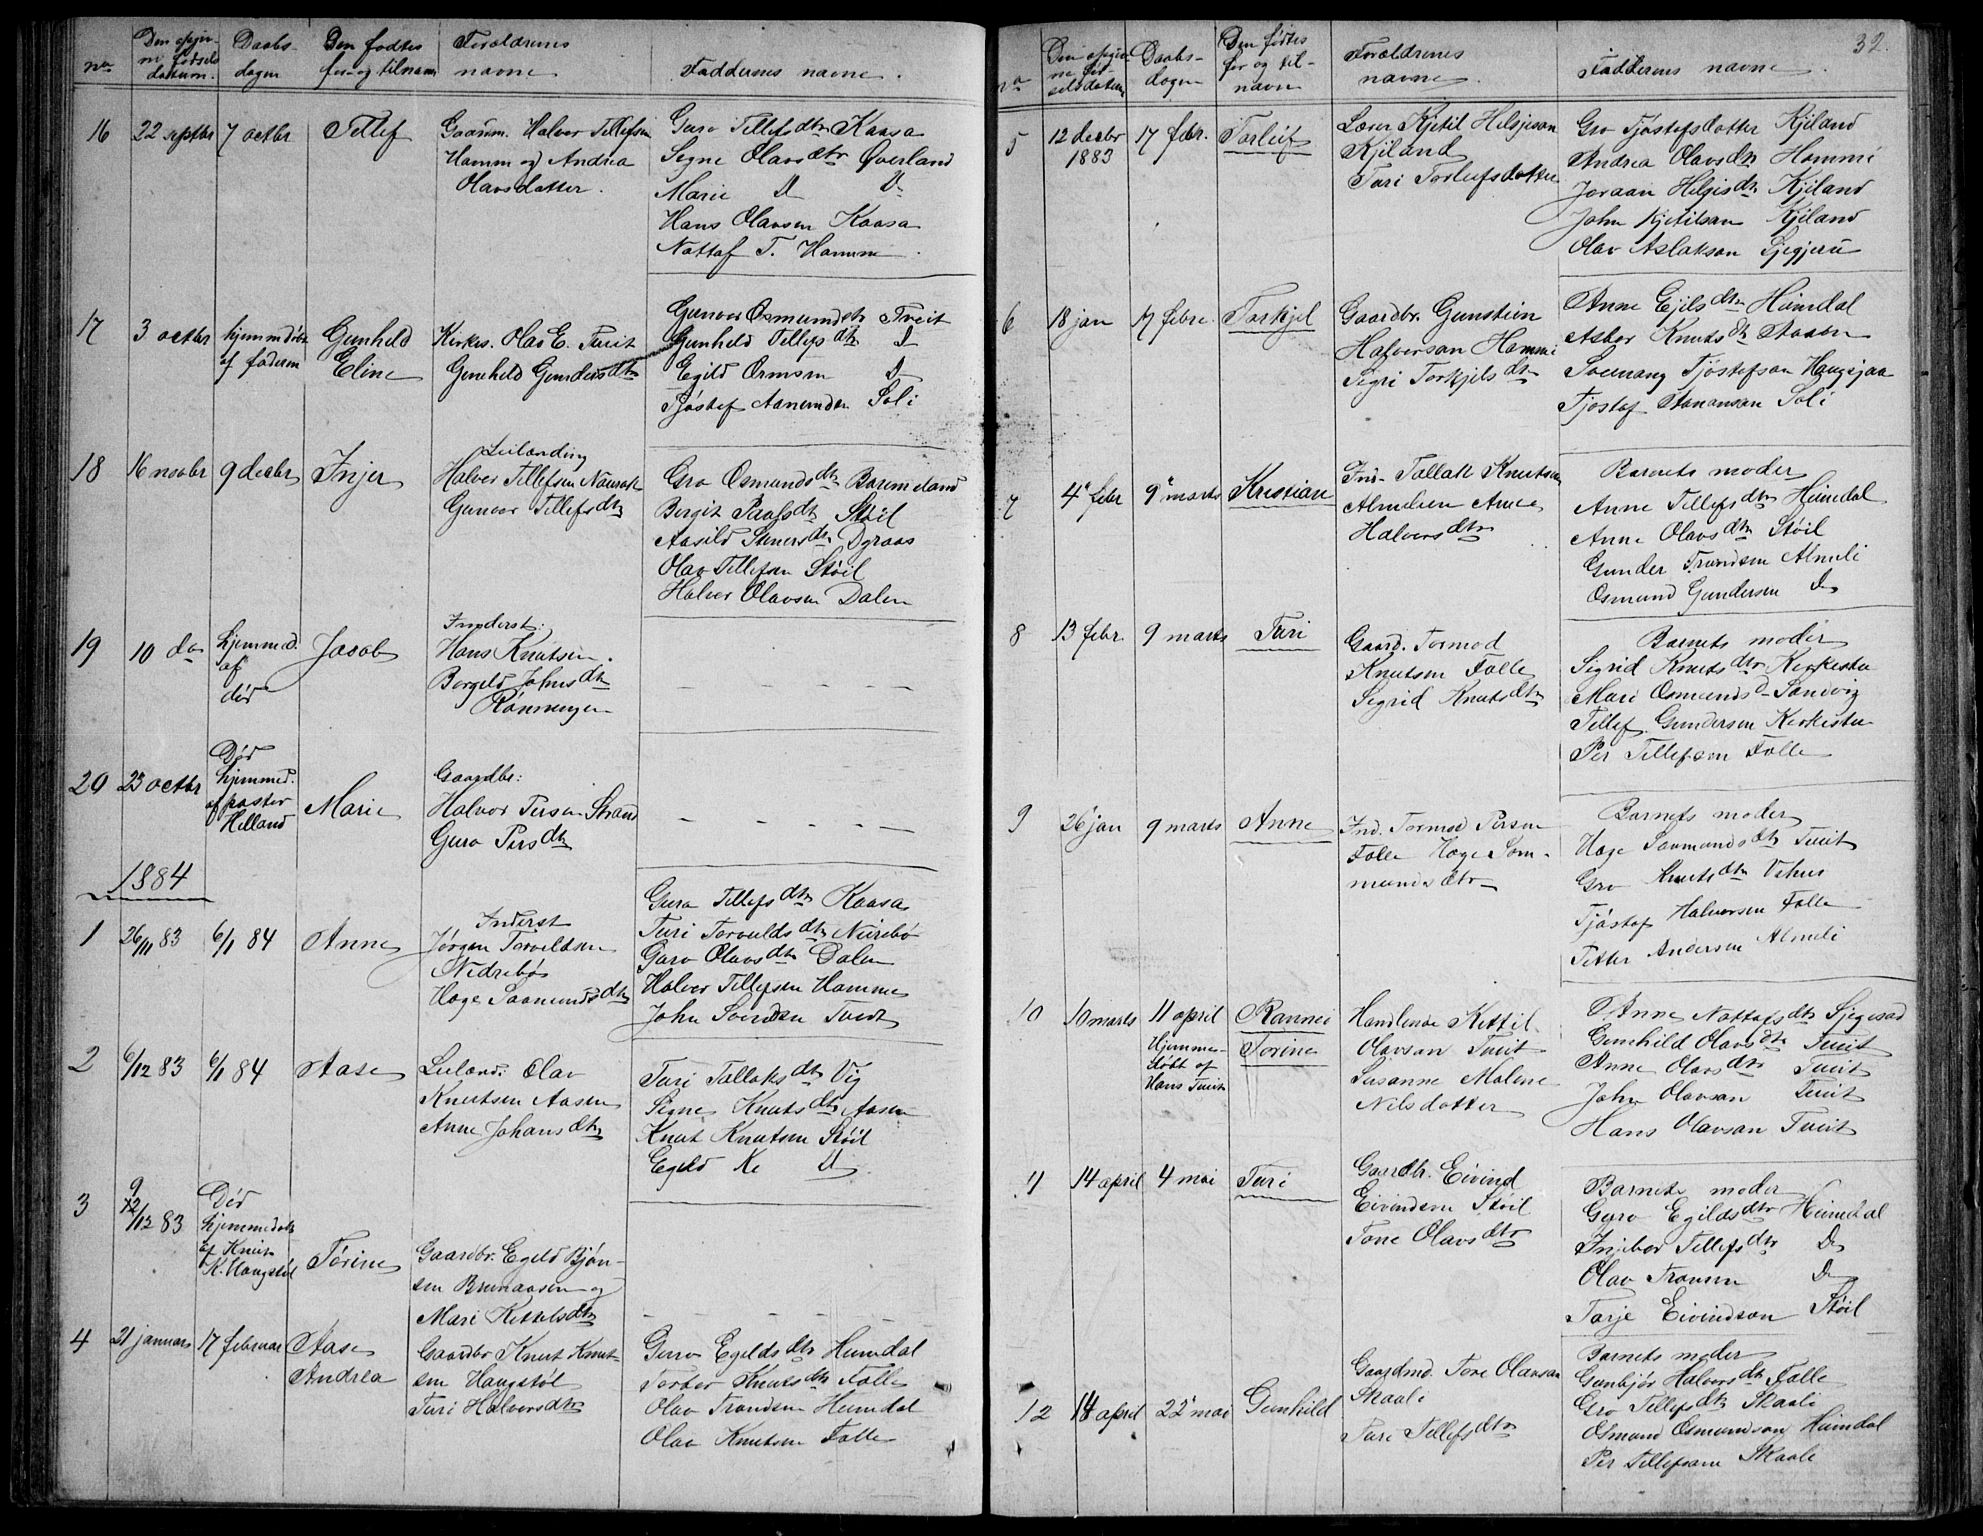 SAKO, Nissedal kirkebøker, G/Gb/L0002: Klokkerbok nr. II 2, 1863-1892, s. 32